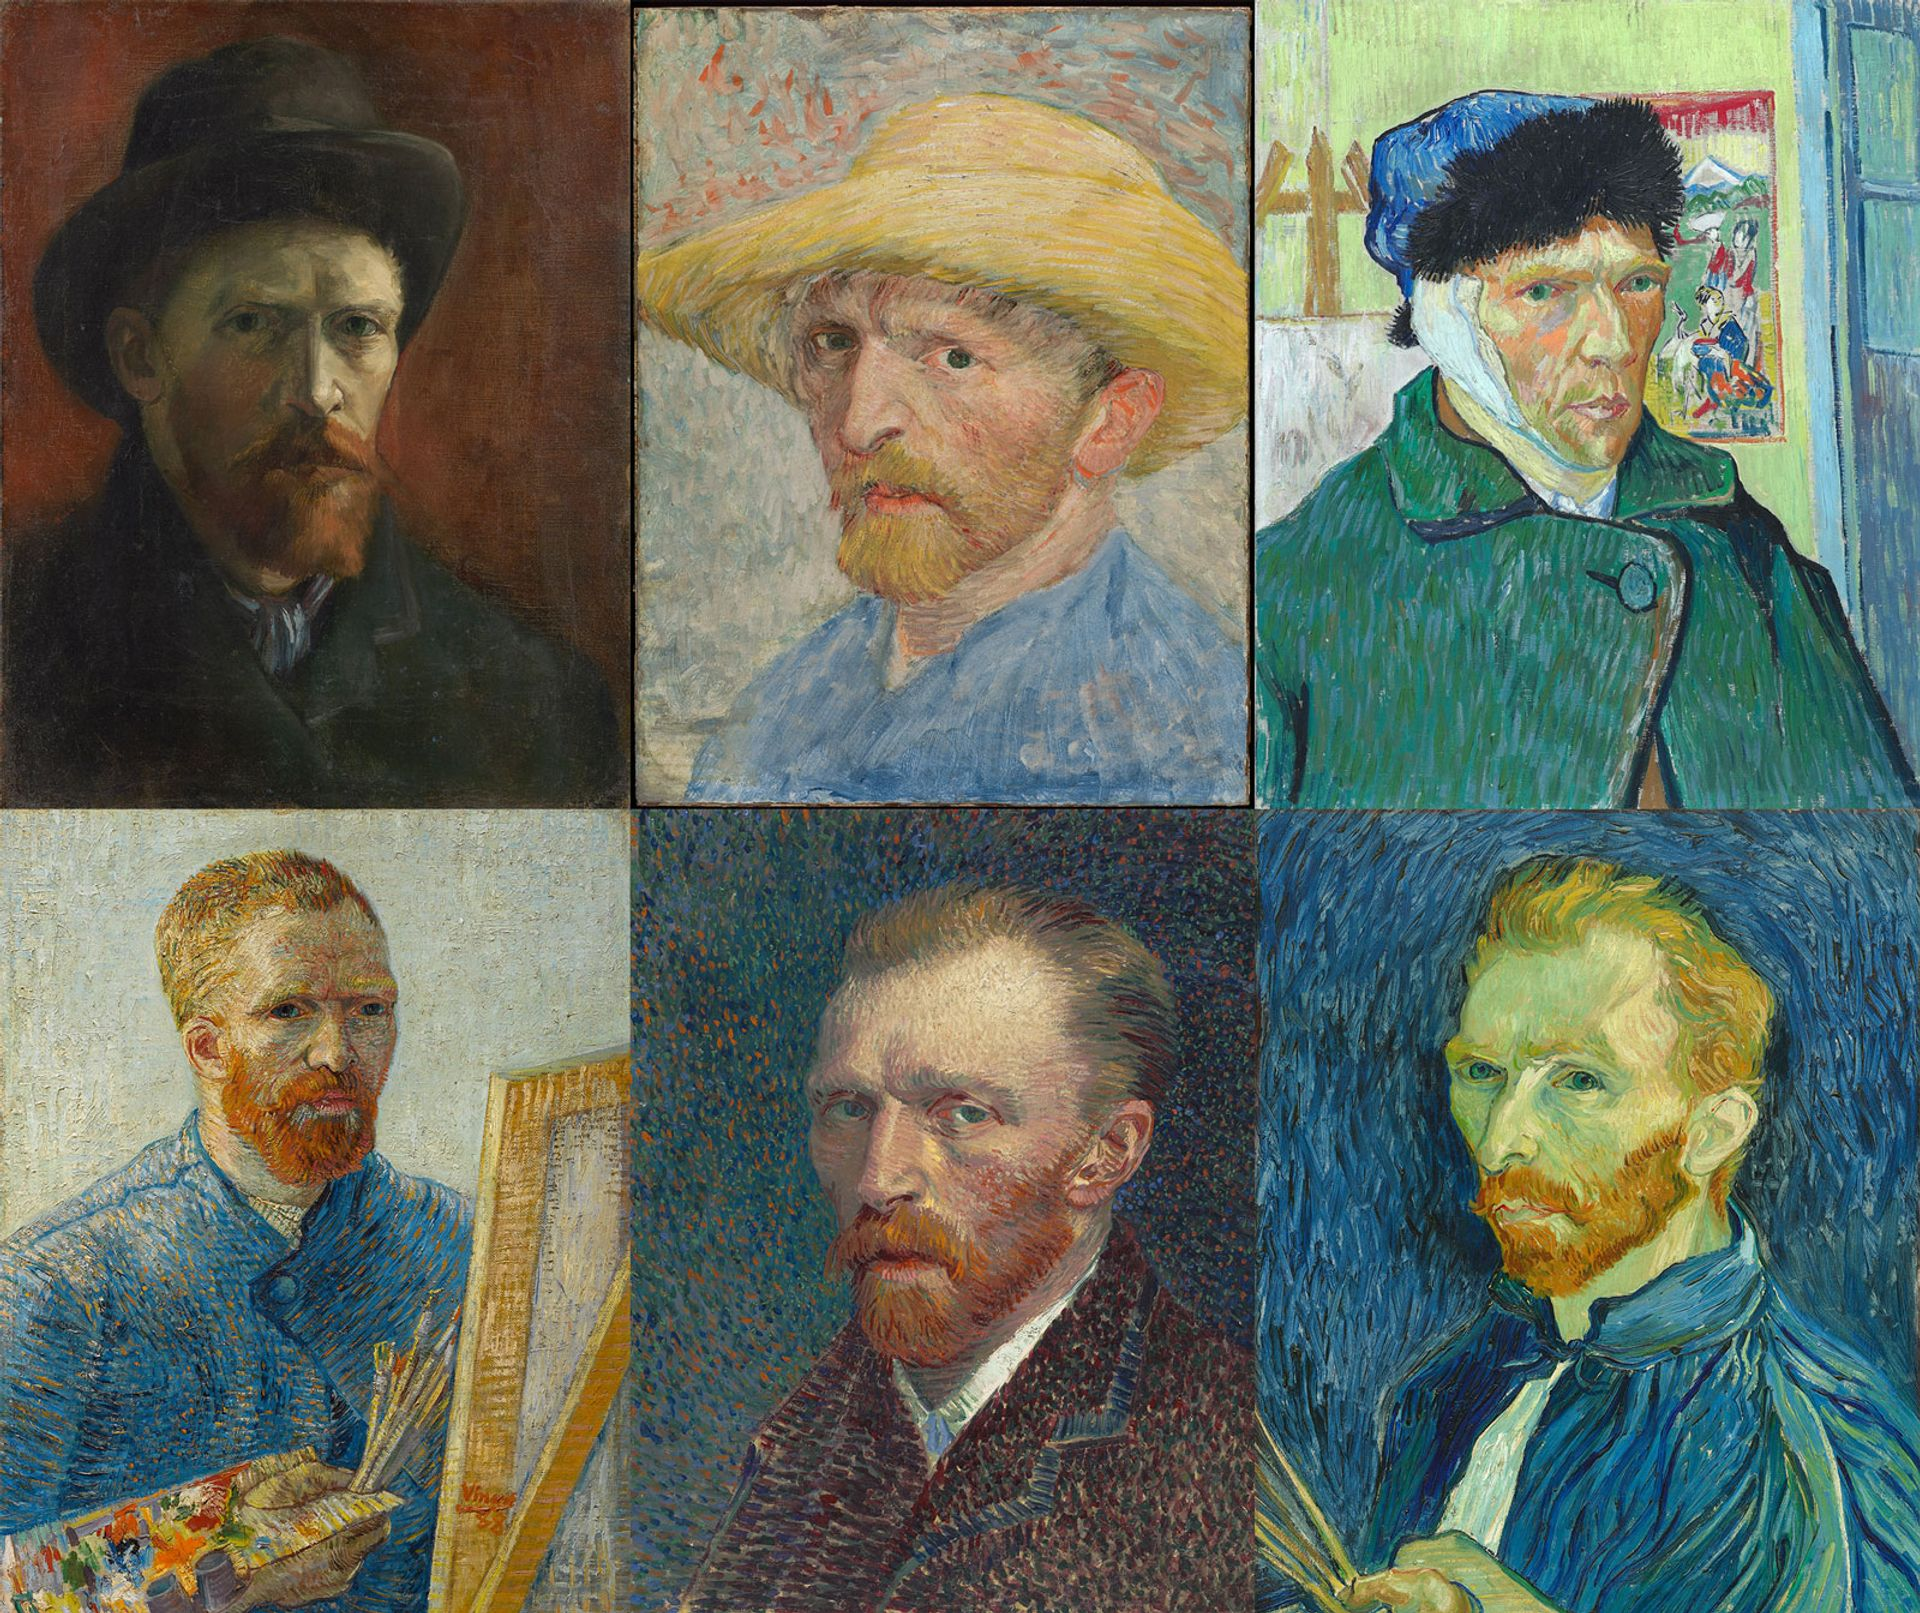 Clockwise from top left: Vincent van Gogh's Self-Portrait with Dark Felt Hat (1886-87), Self-Portrait with Straw Hat (1887), Self-Portrait with Bandaged Ear (1889), Self-Portrait (1889), Self-Portrait (1887) and Self-Portrait as a Painter (1888) © Vincent van Gogh Foundation; Detroit Institute of Arts / Bridgeman Images; Courtauld; National Gallery of Art, Washington DC; Art Institute of Chicago, CC Zero; Vincent van Gogh Foundation